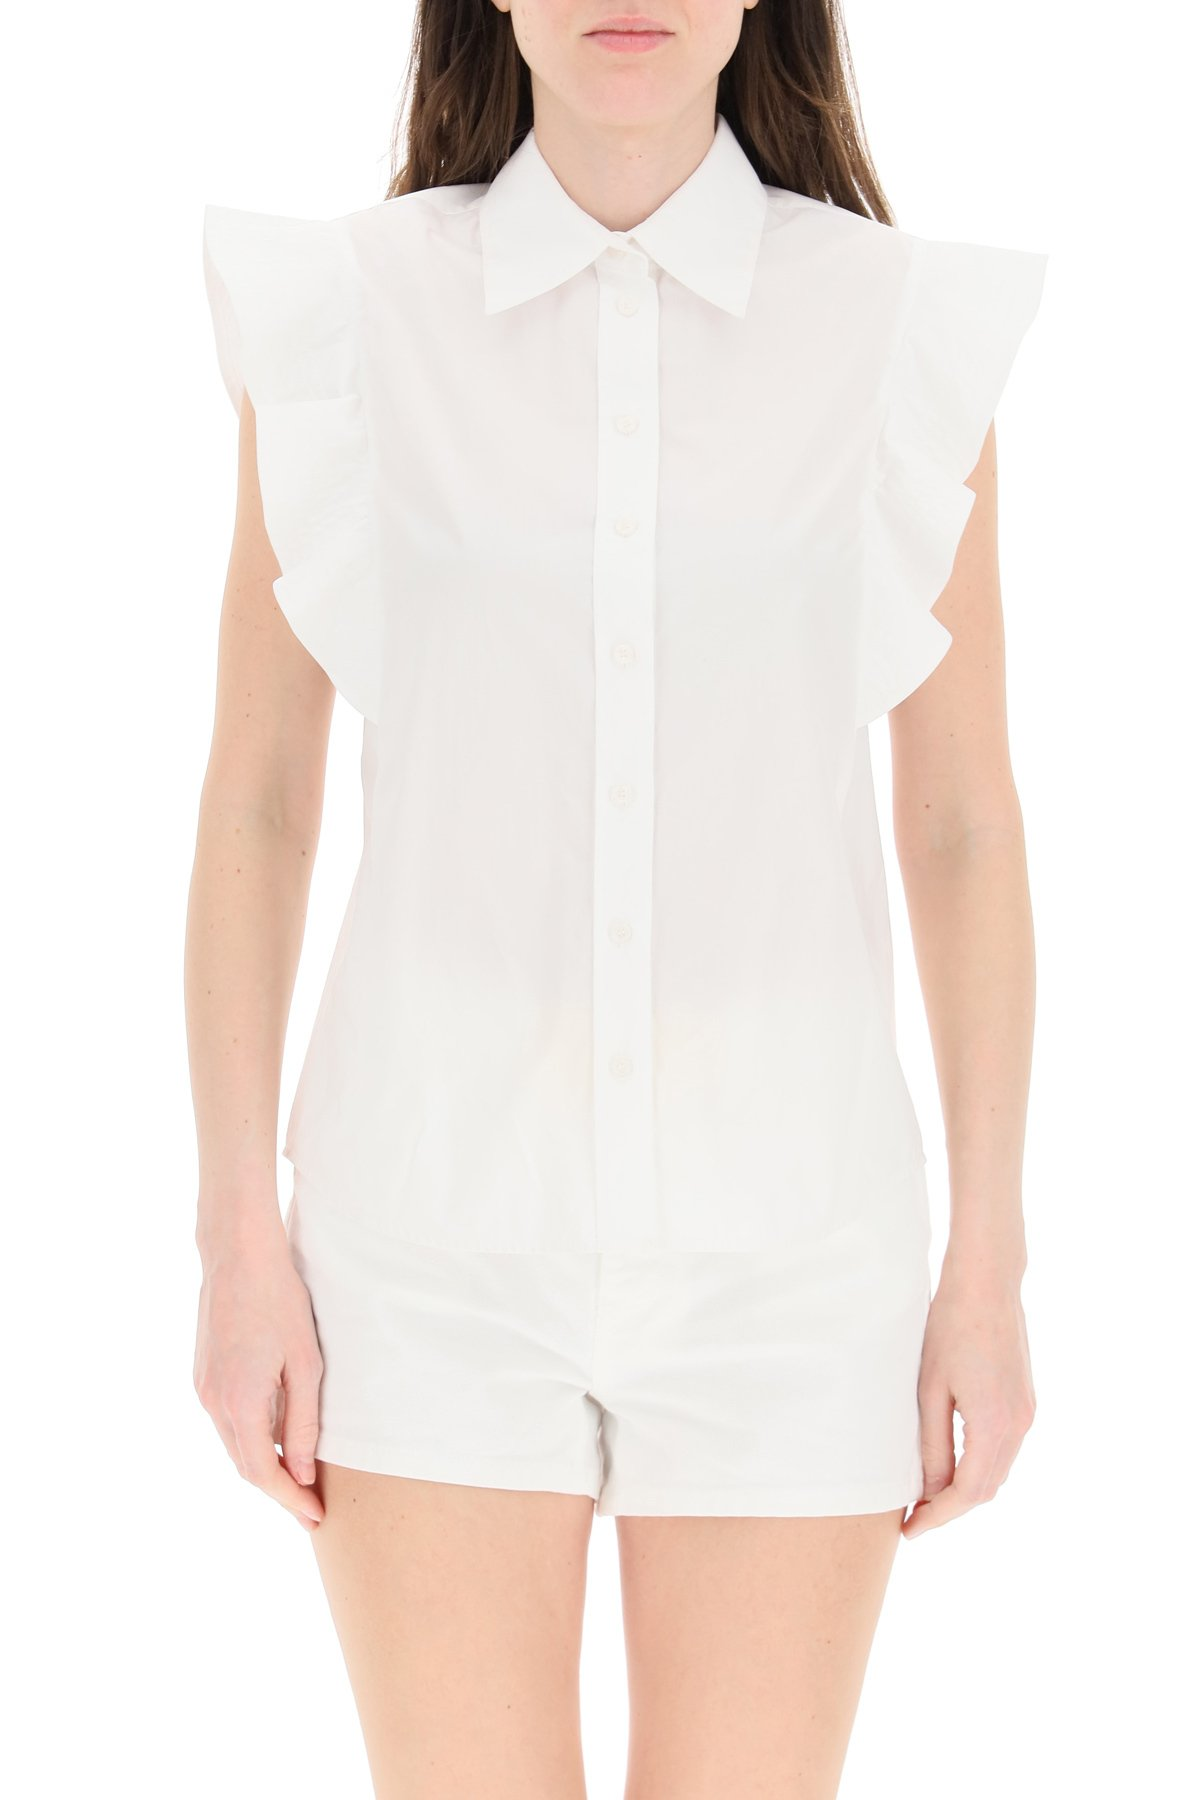 Pinko camicia con rouches nakoma 1